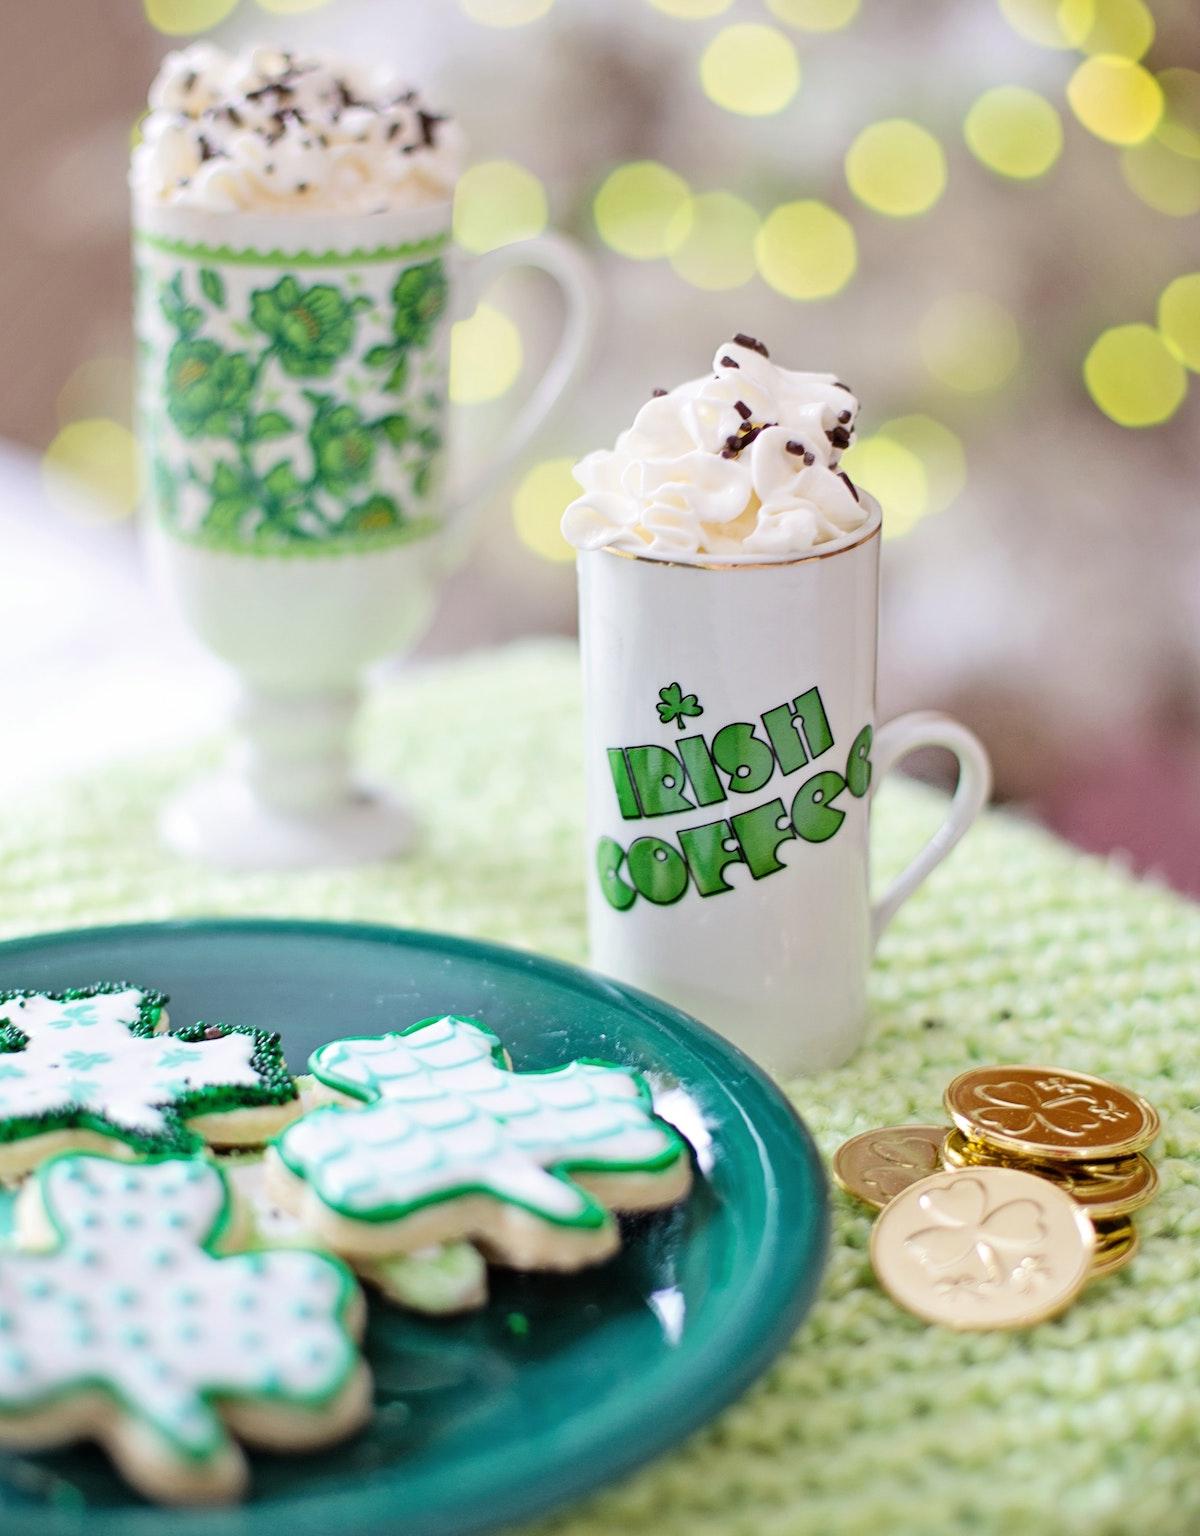 what do the Irish eat on st Patricks day?